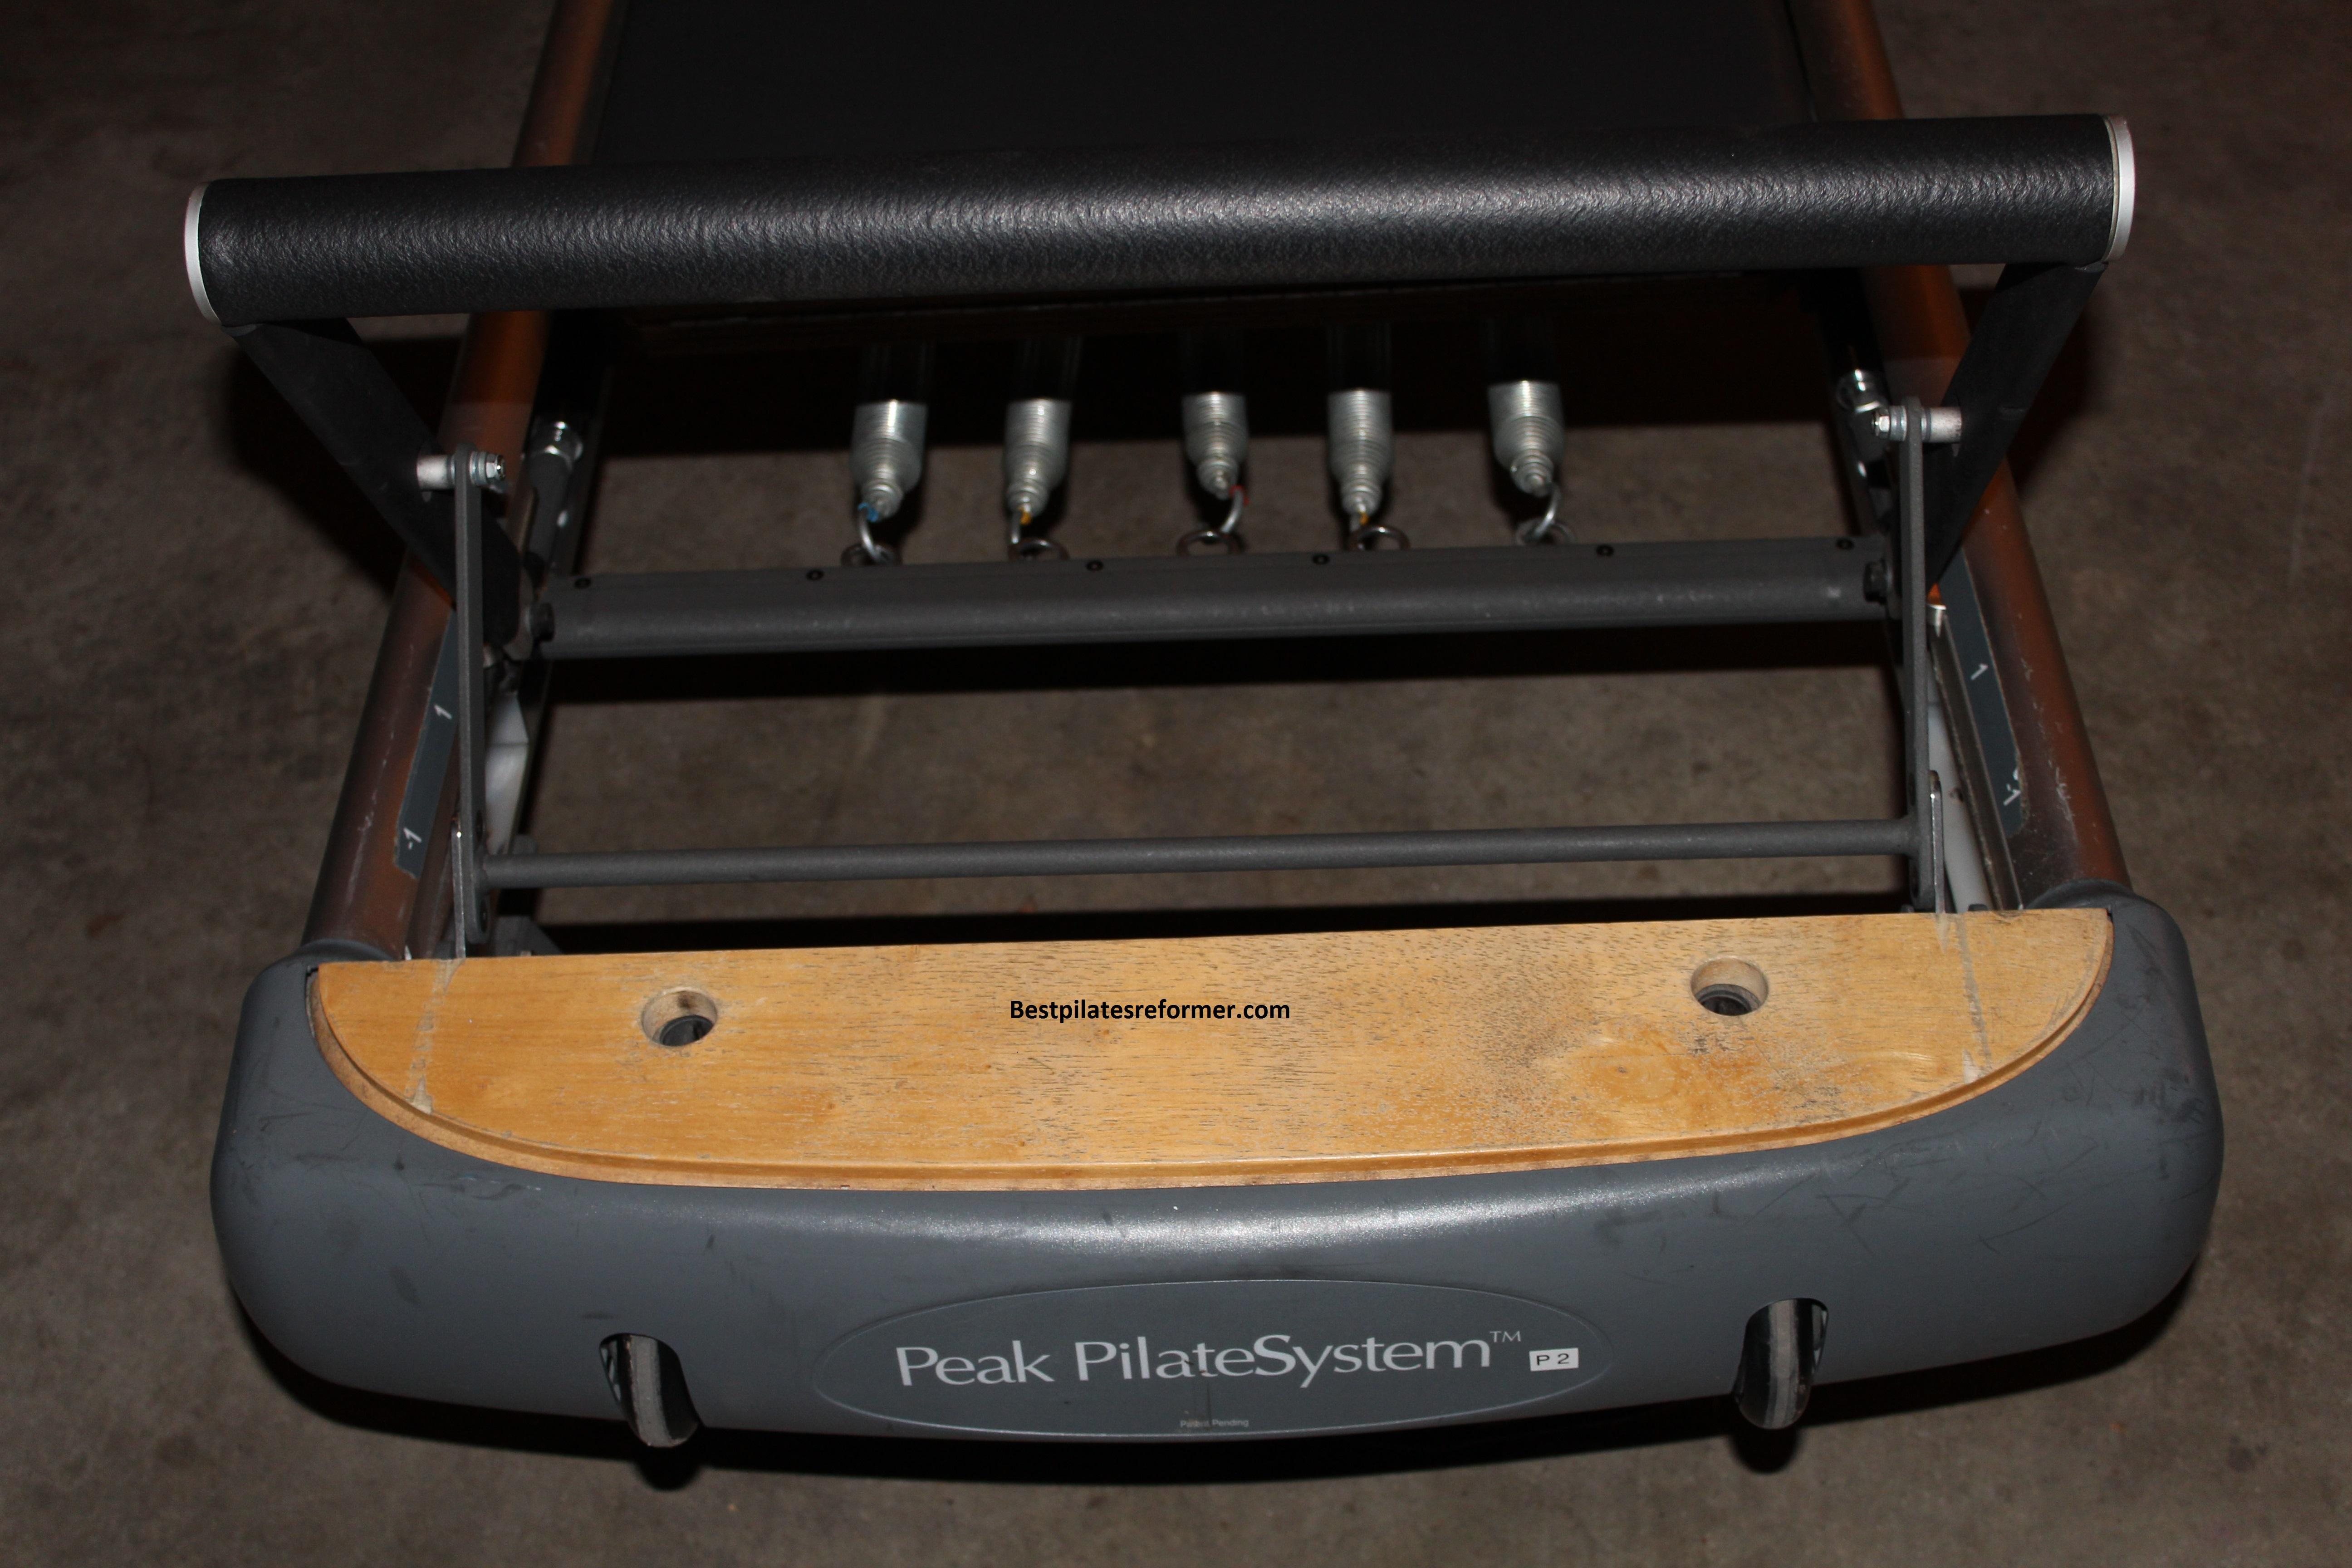 peak pilates deluxe Reformer